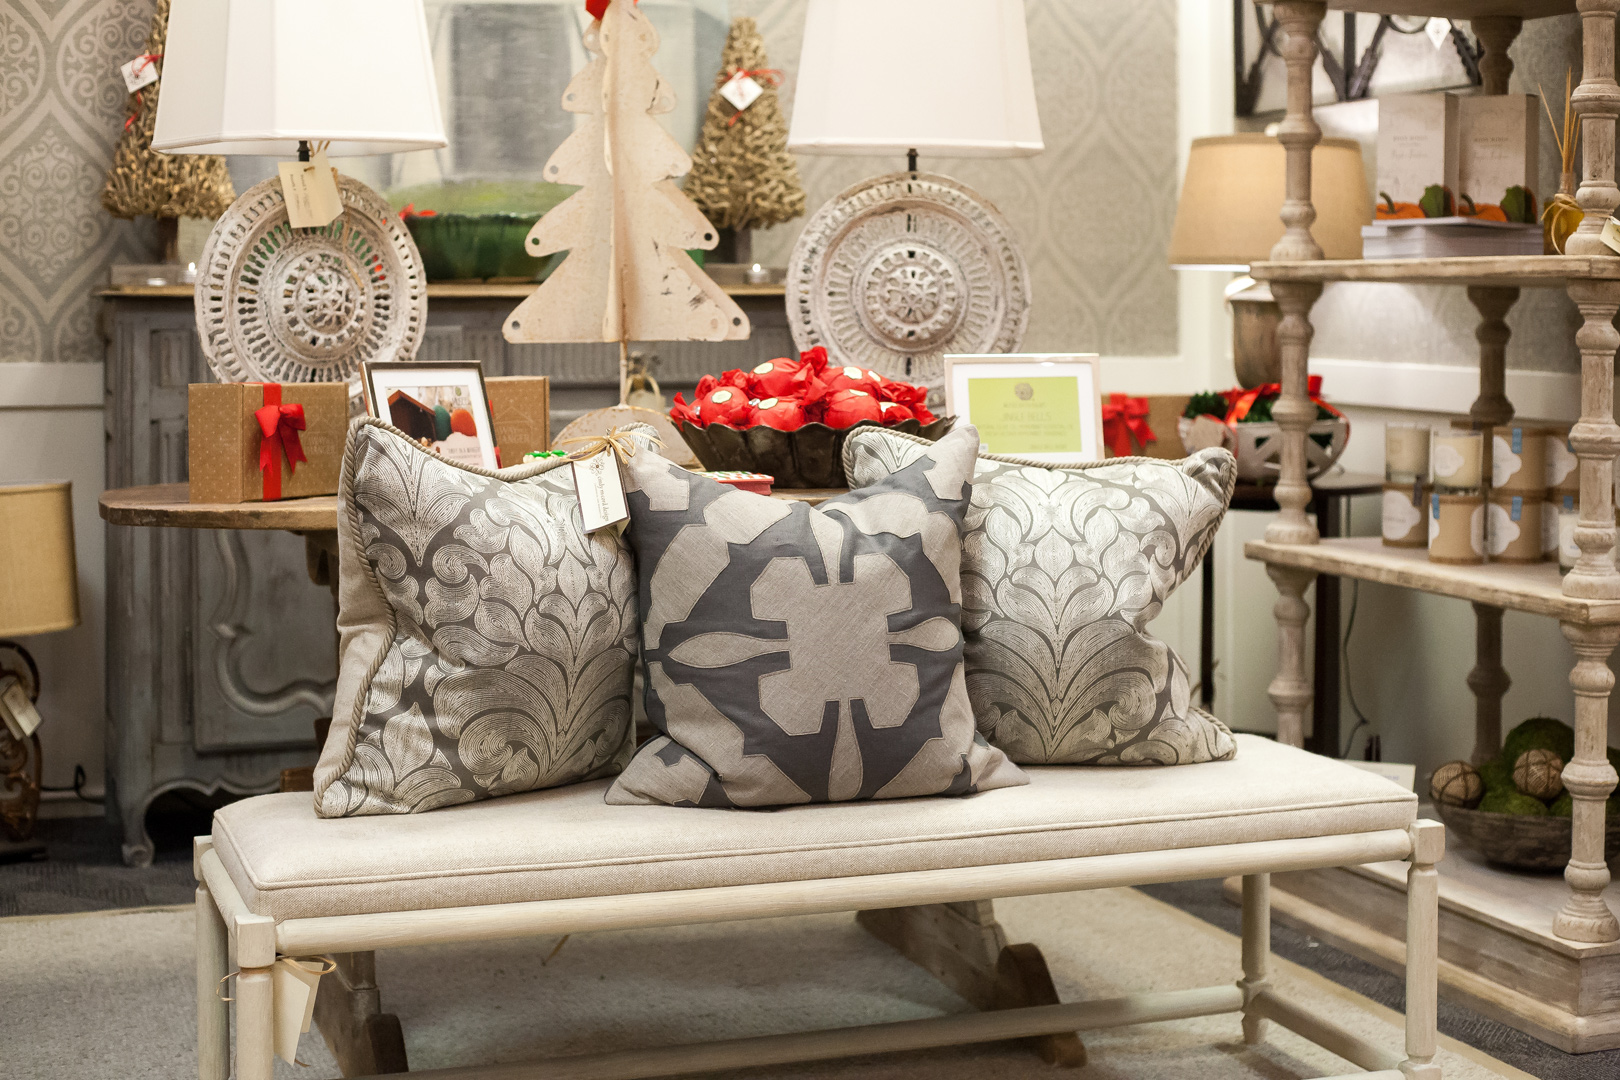 Cindy-McCord-Design-Retail-12.jpg